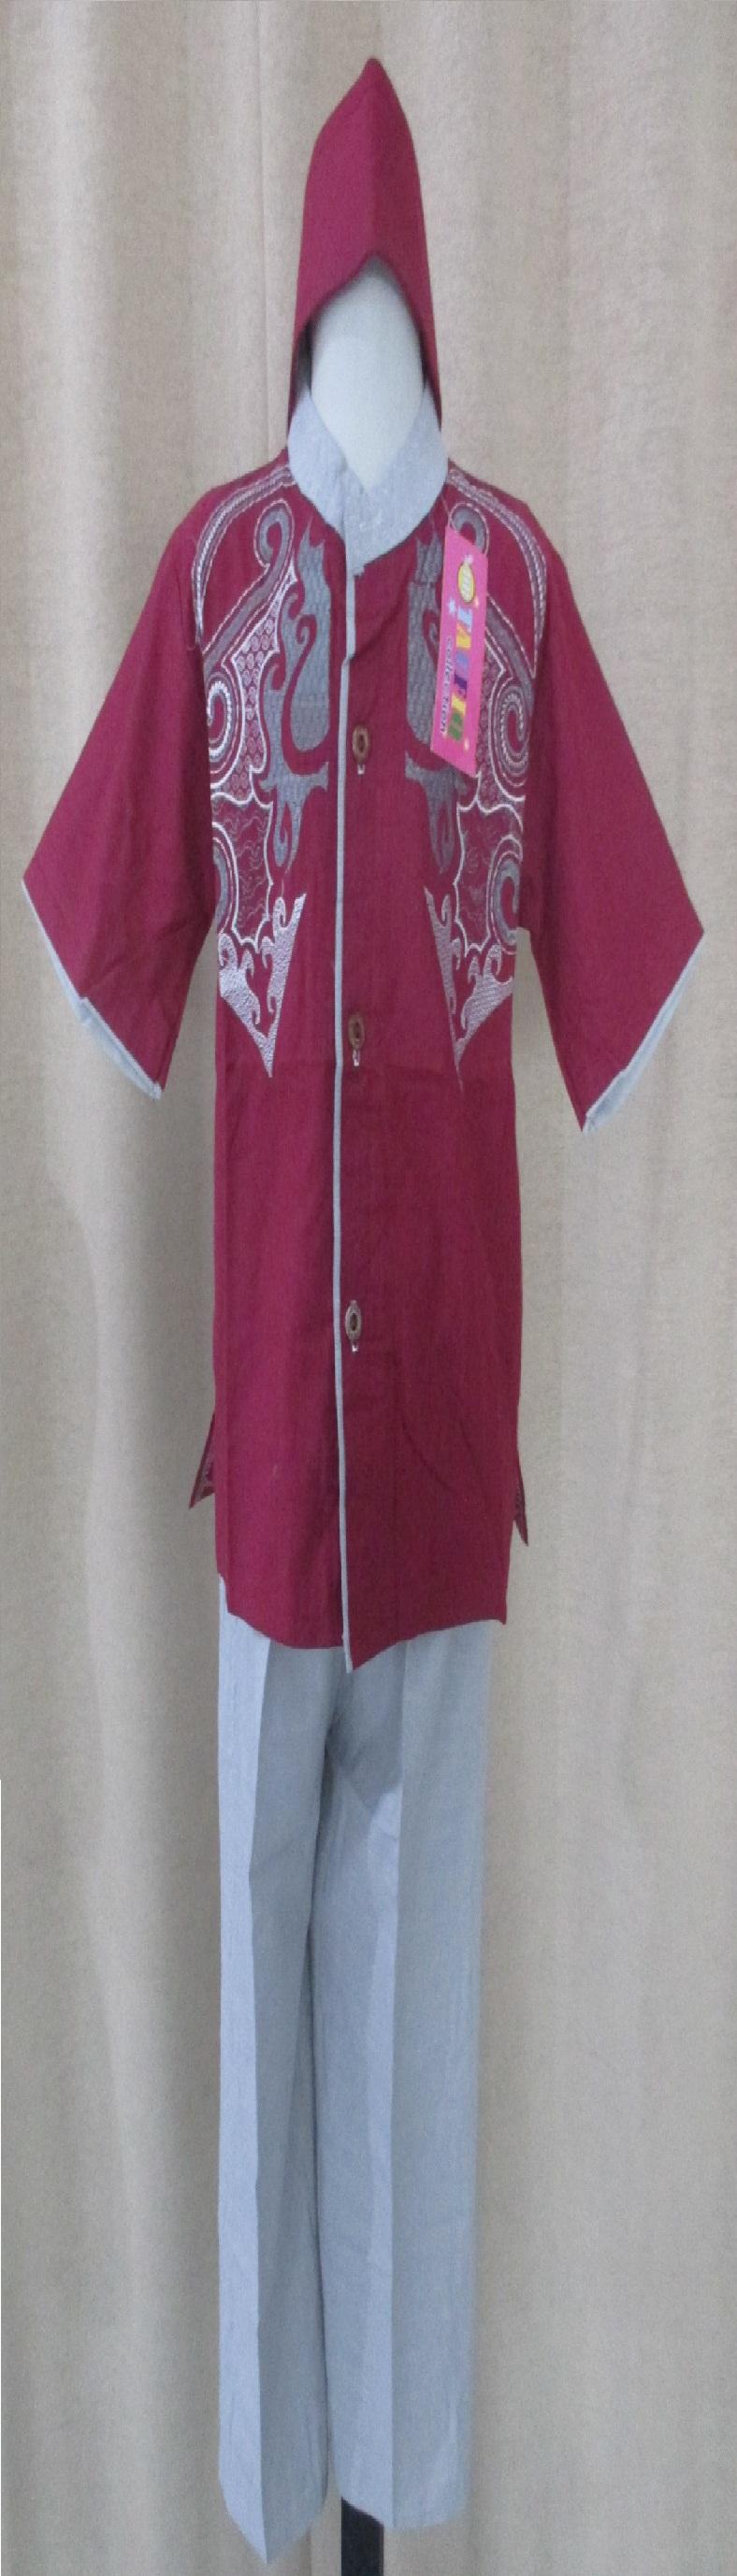 Baju Koko Toufiq Murah Meriah